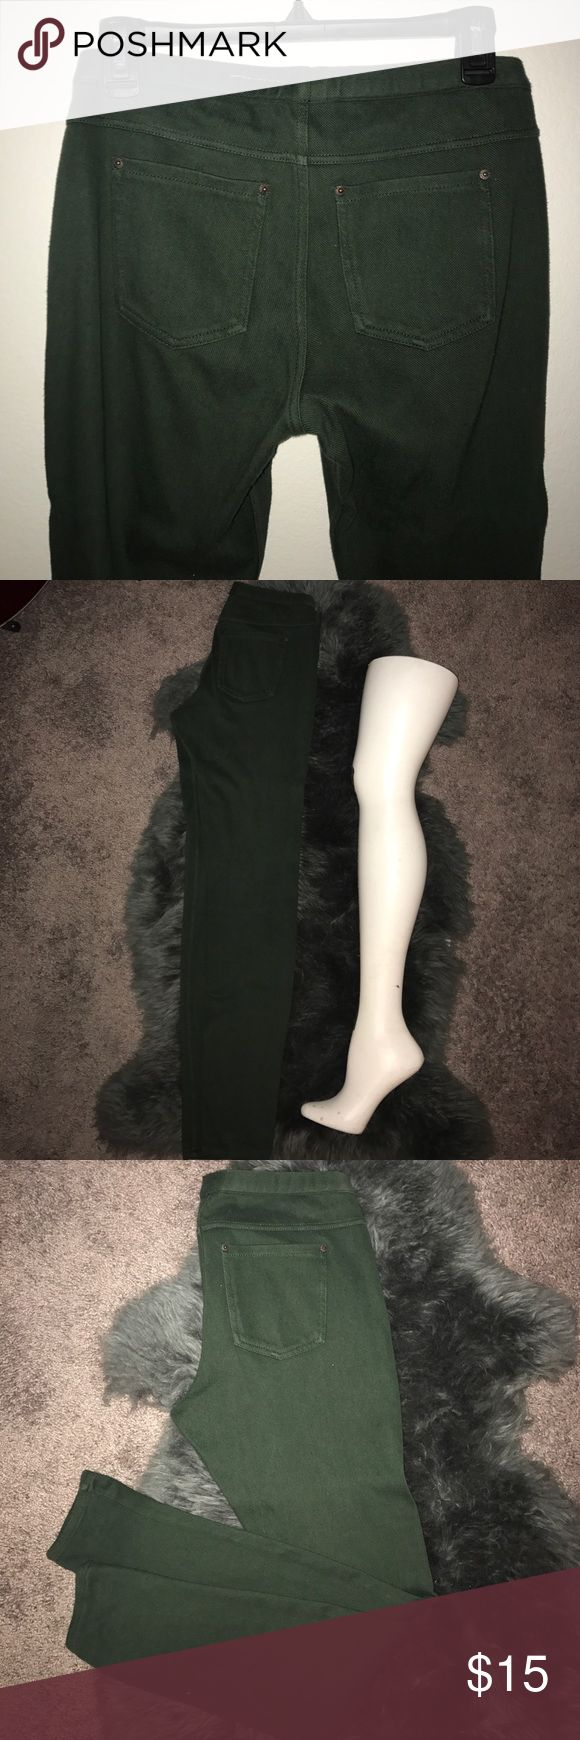 Dark Green Pants Hunter green jeggings. Pockets on the back, elastic waistband. Size medium - size 28/29. Gently used. HUE Pants Leggings